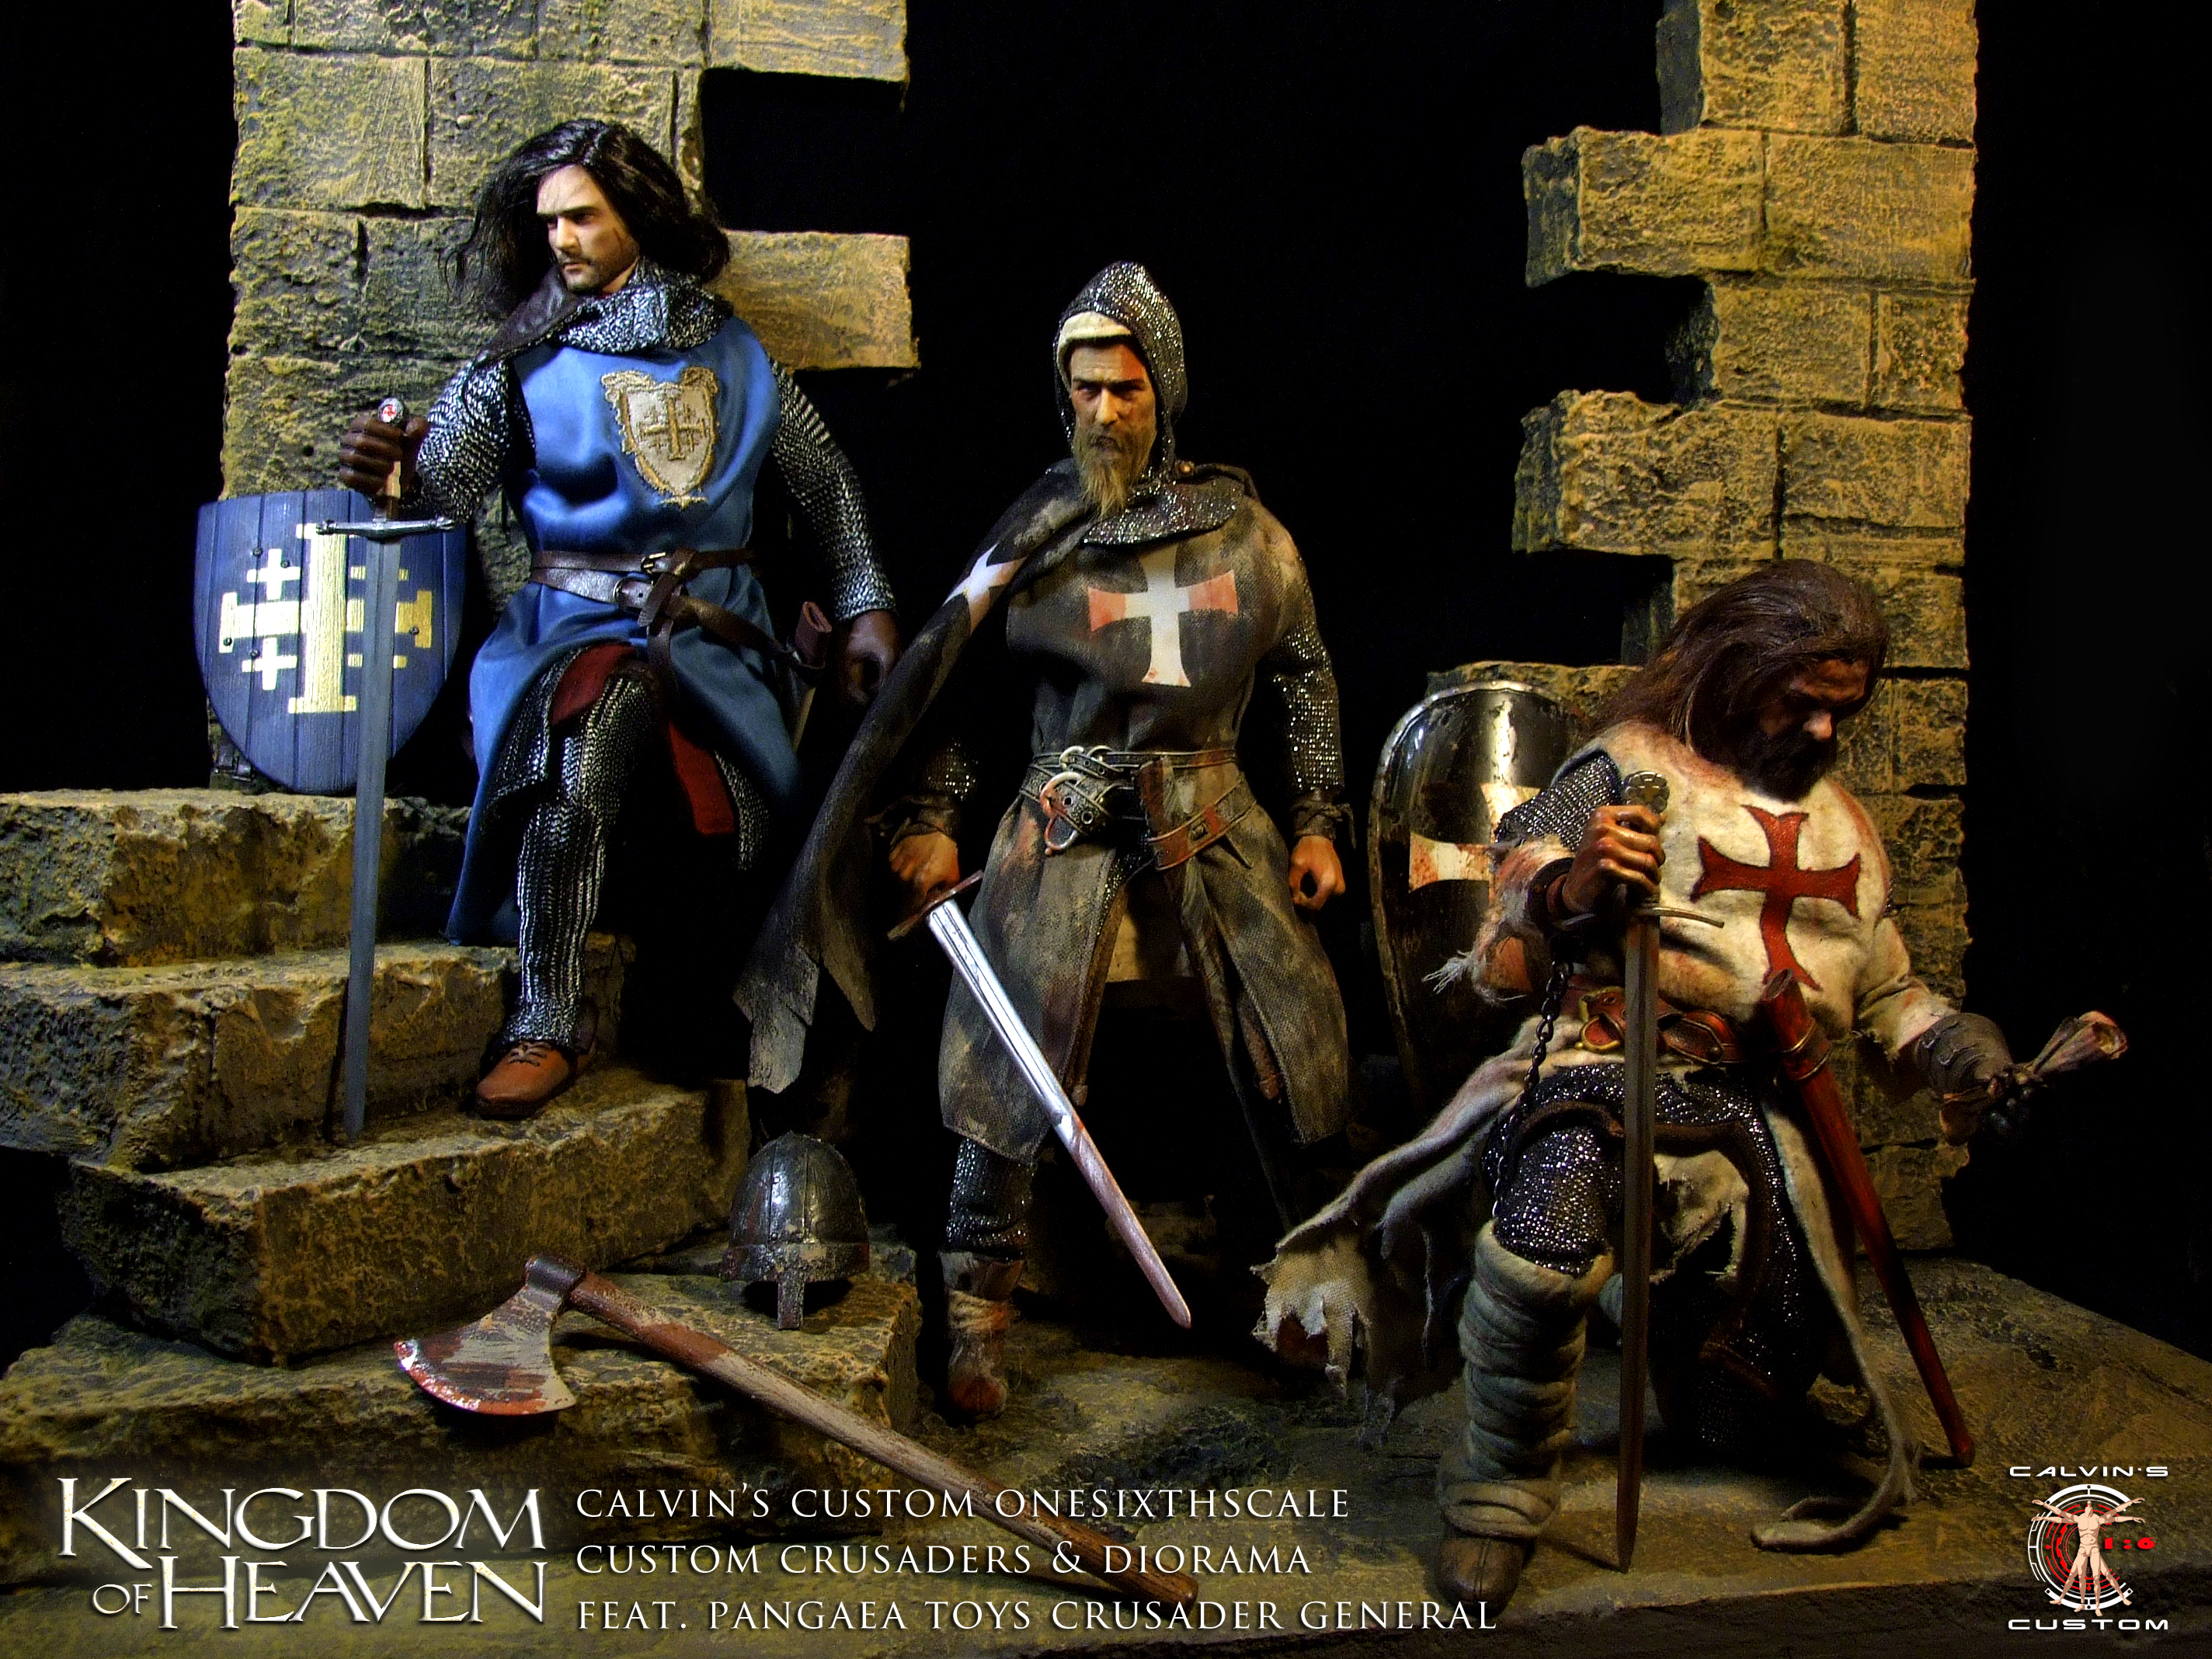 kingdom of